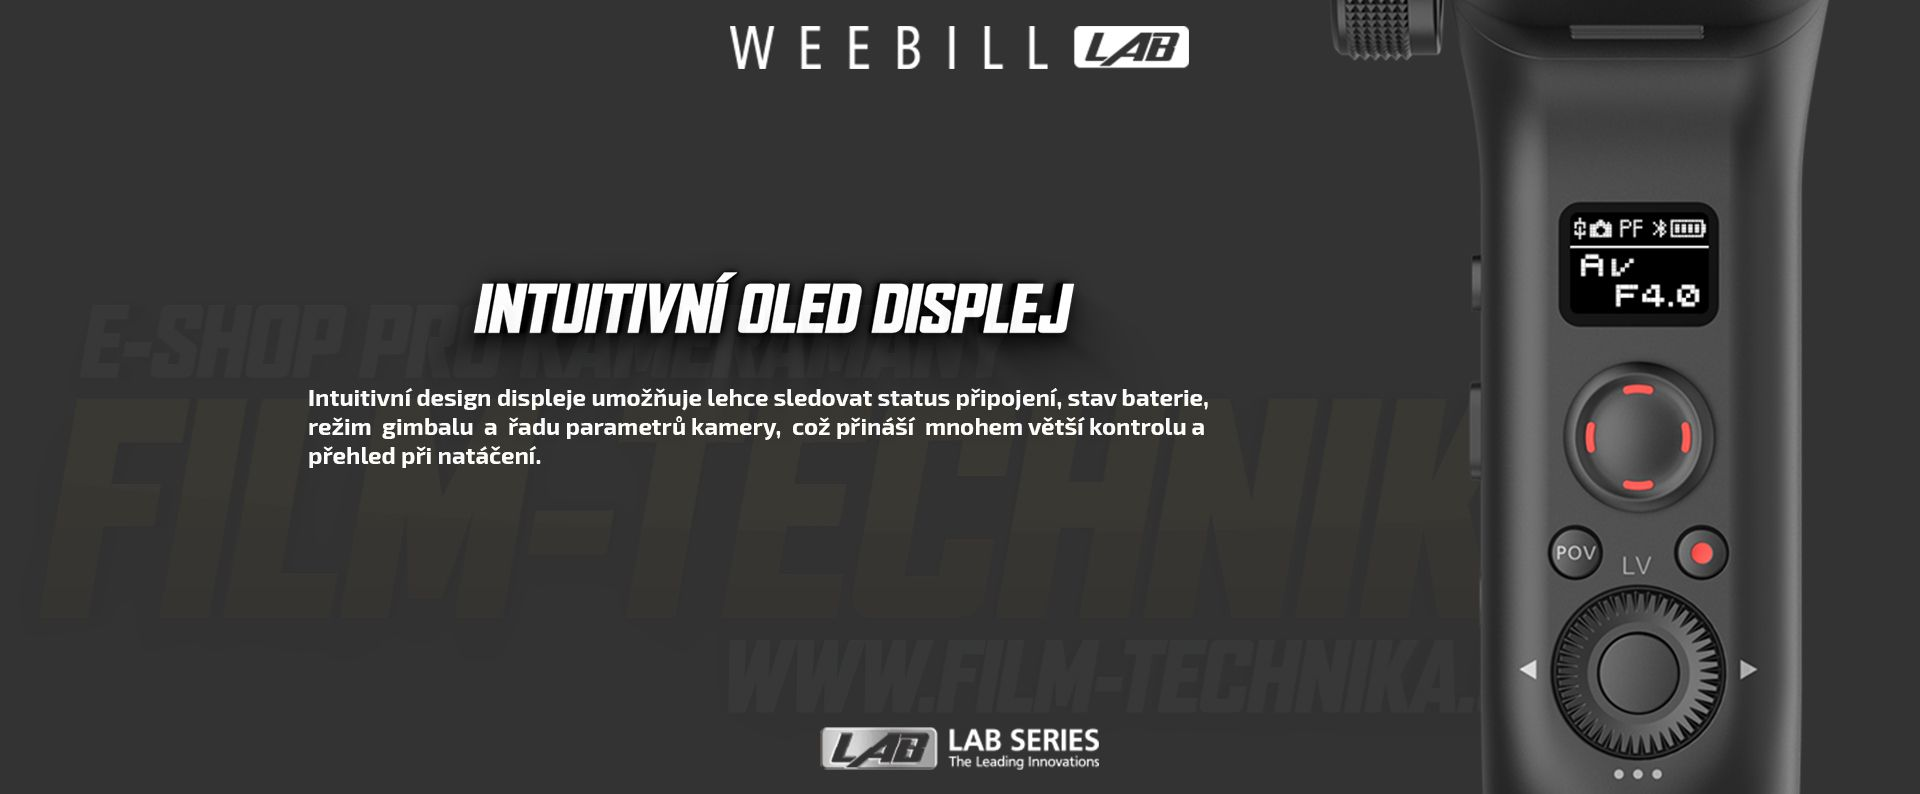 film-technika-zhiyun-weebill-lab-intext3